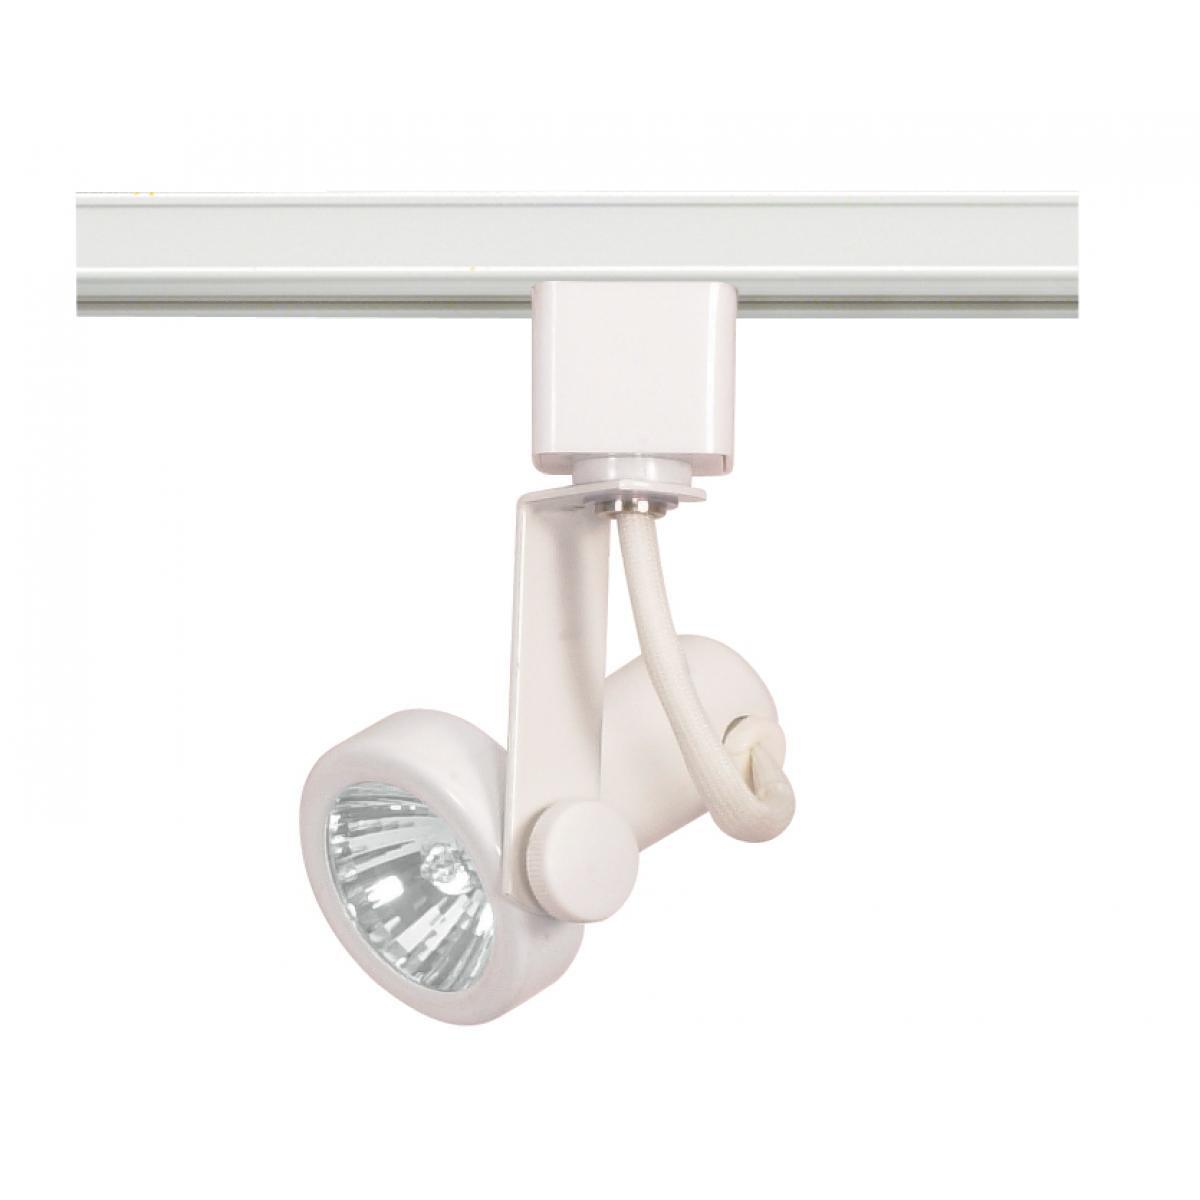 Nuvo Lighting 1 Light Mr16 Gimbal Ring Track Head Wayfair